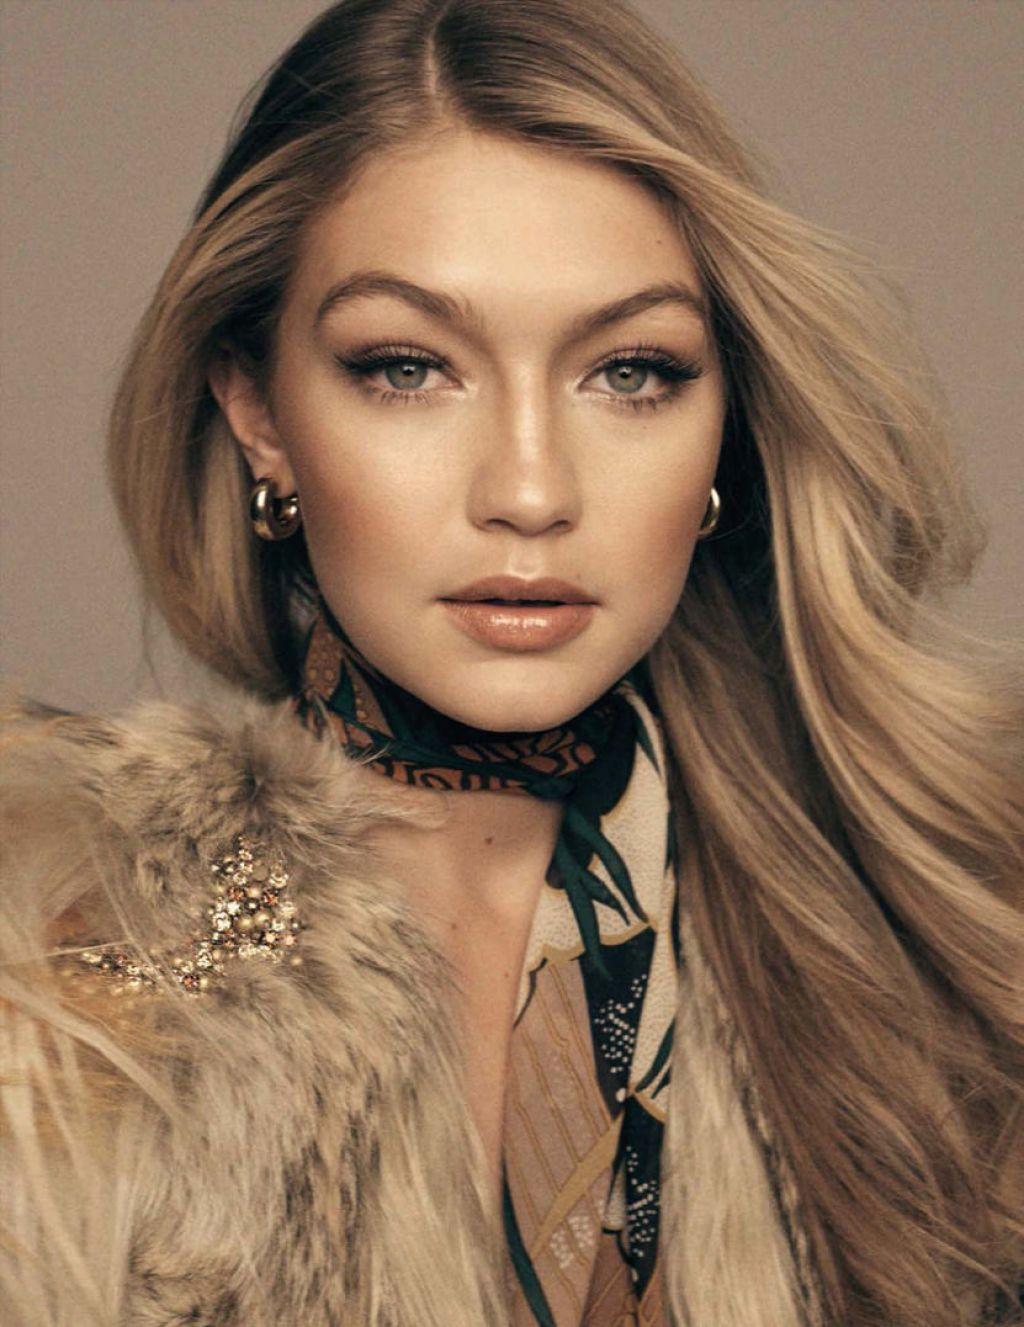 Gigi Hadid Vogue Magazine Spain March 2015 Issue